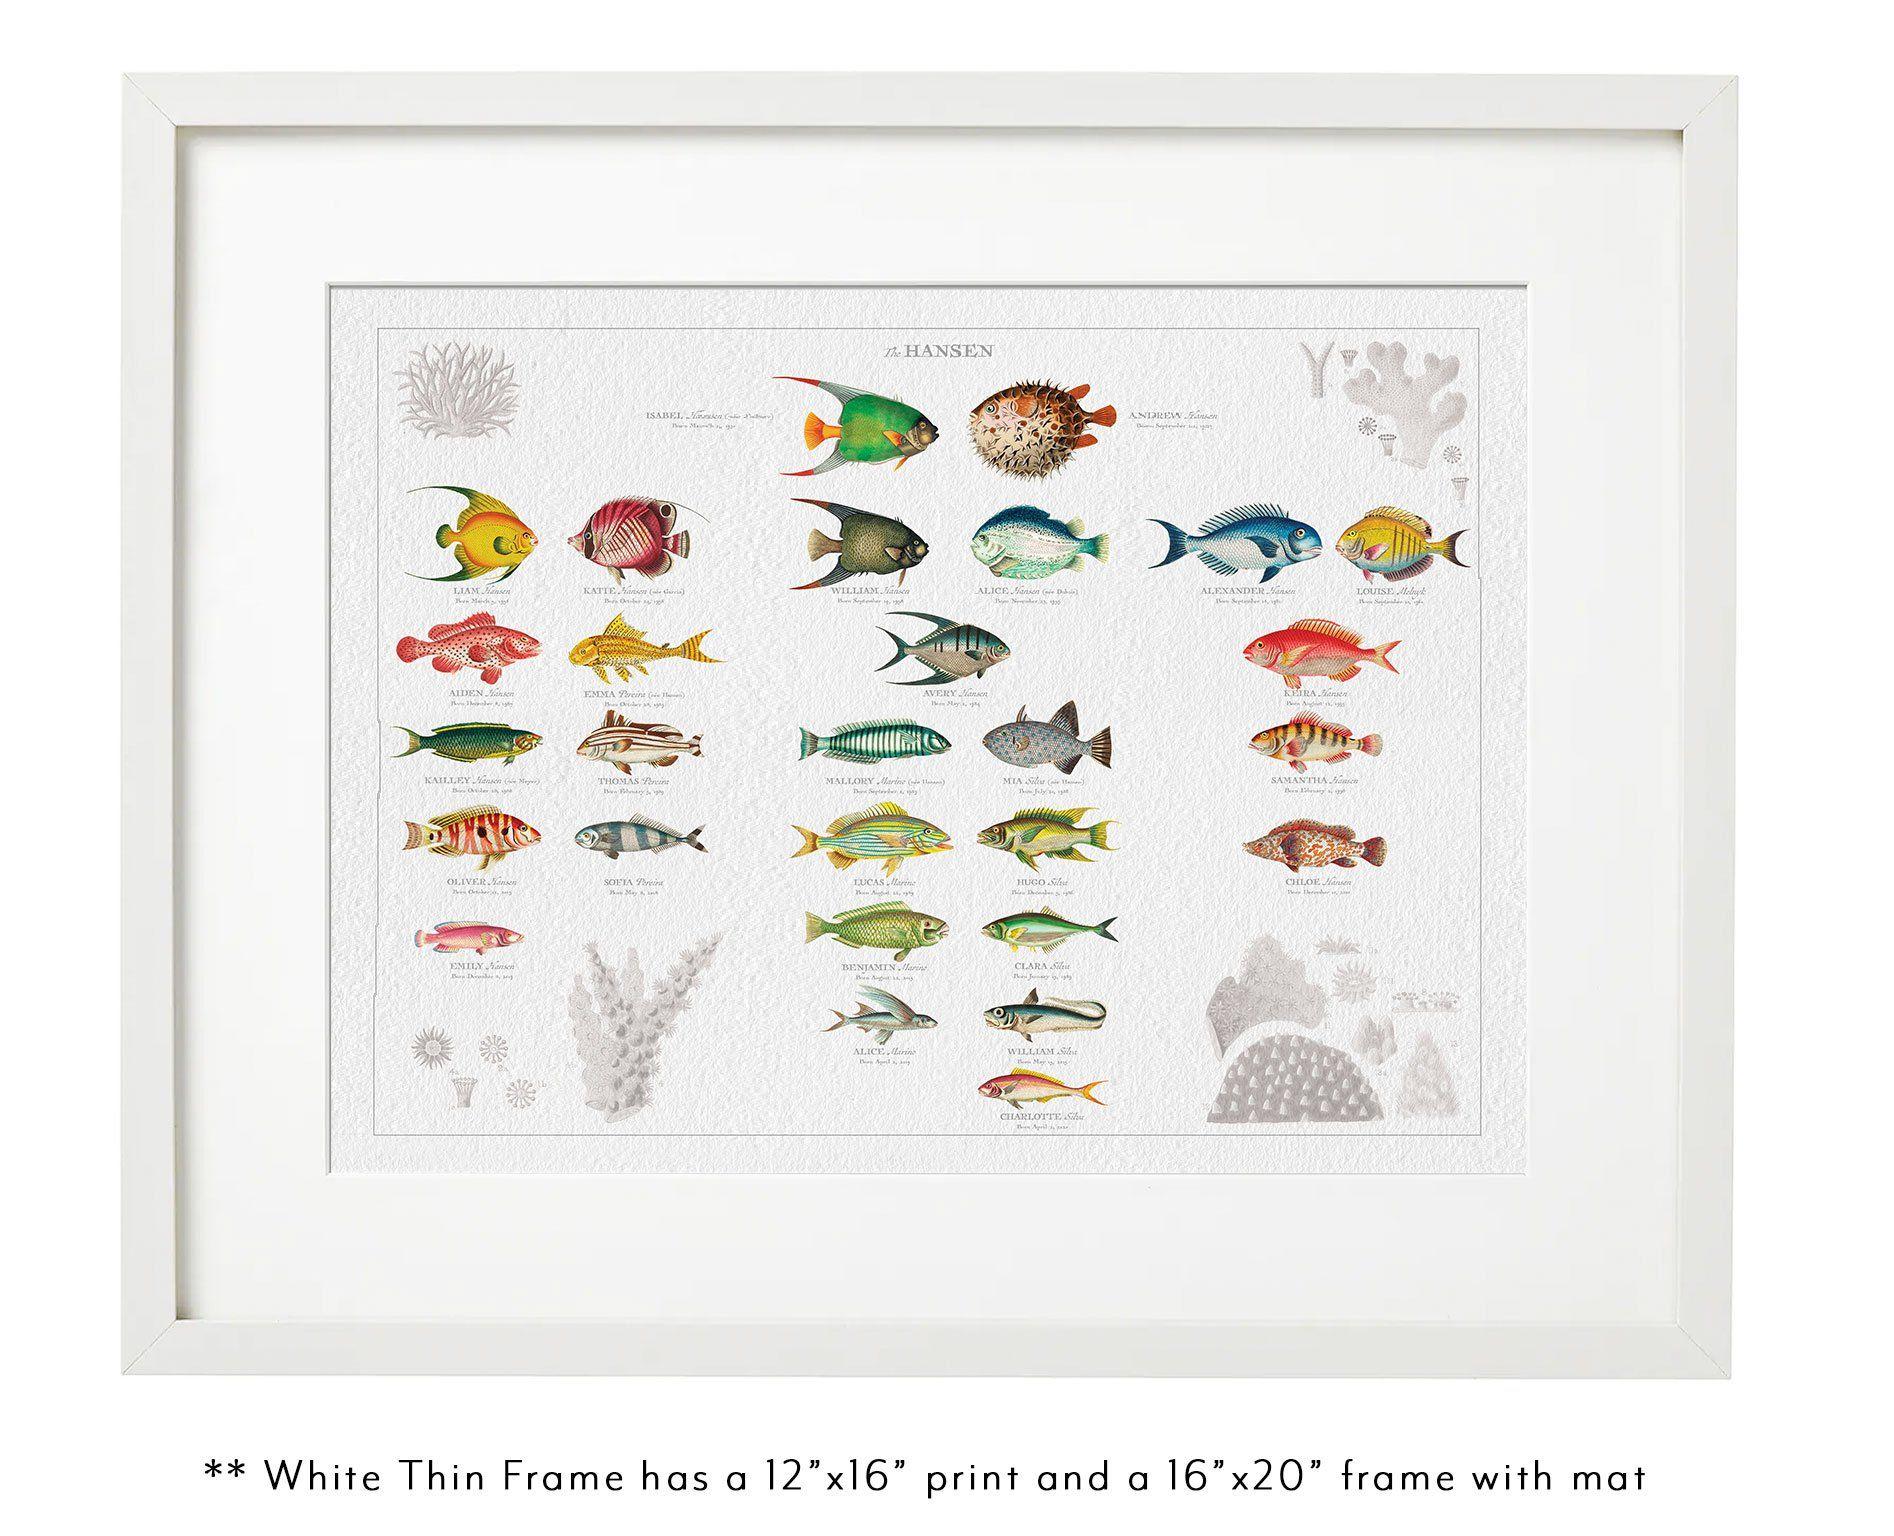 VINTAGE FISH FAMILY BOTANIC 16 x 12 Thin White